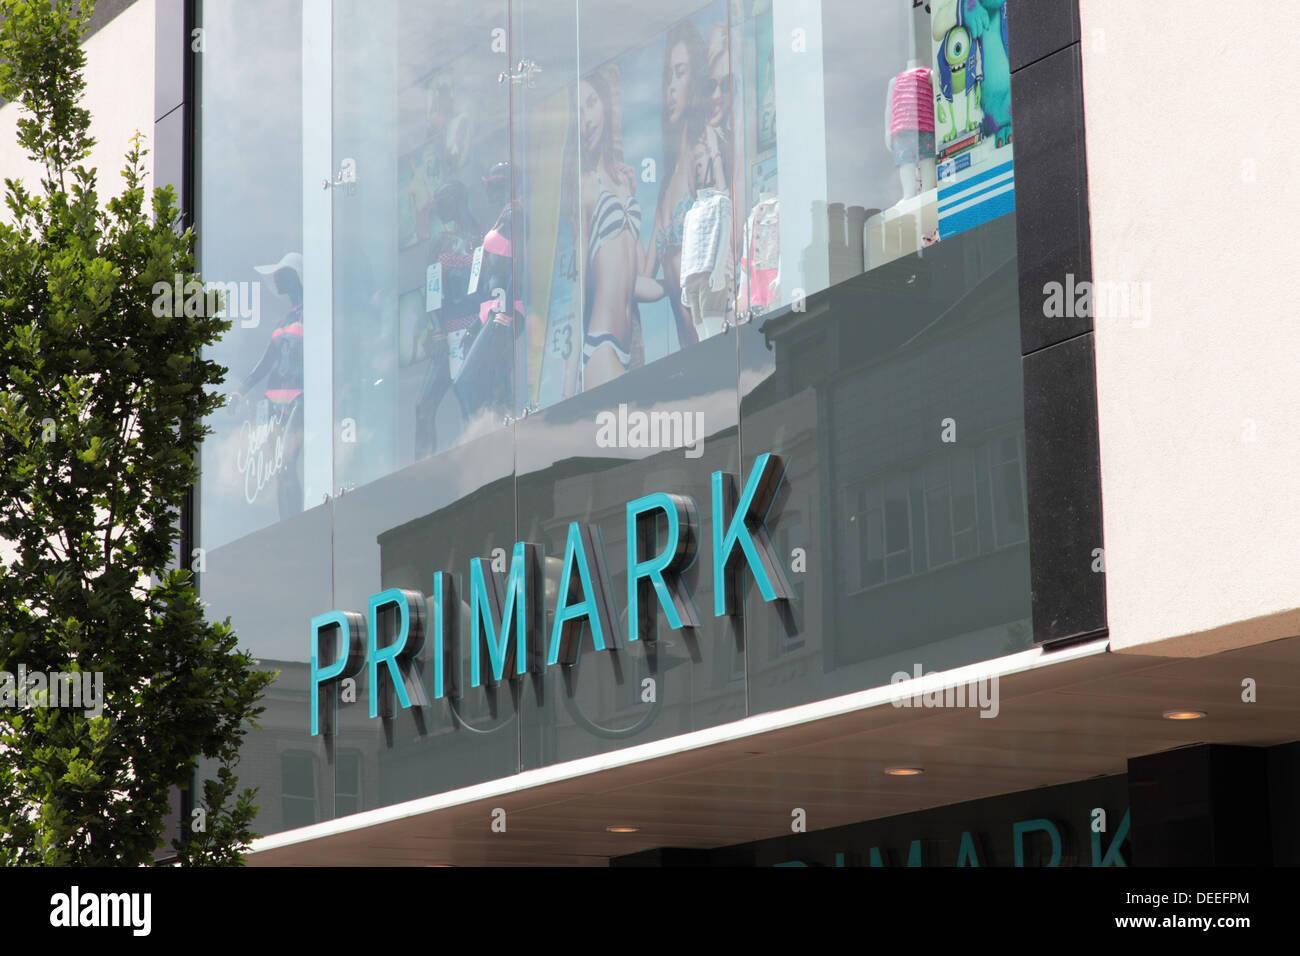 Primark signage - Stock Image